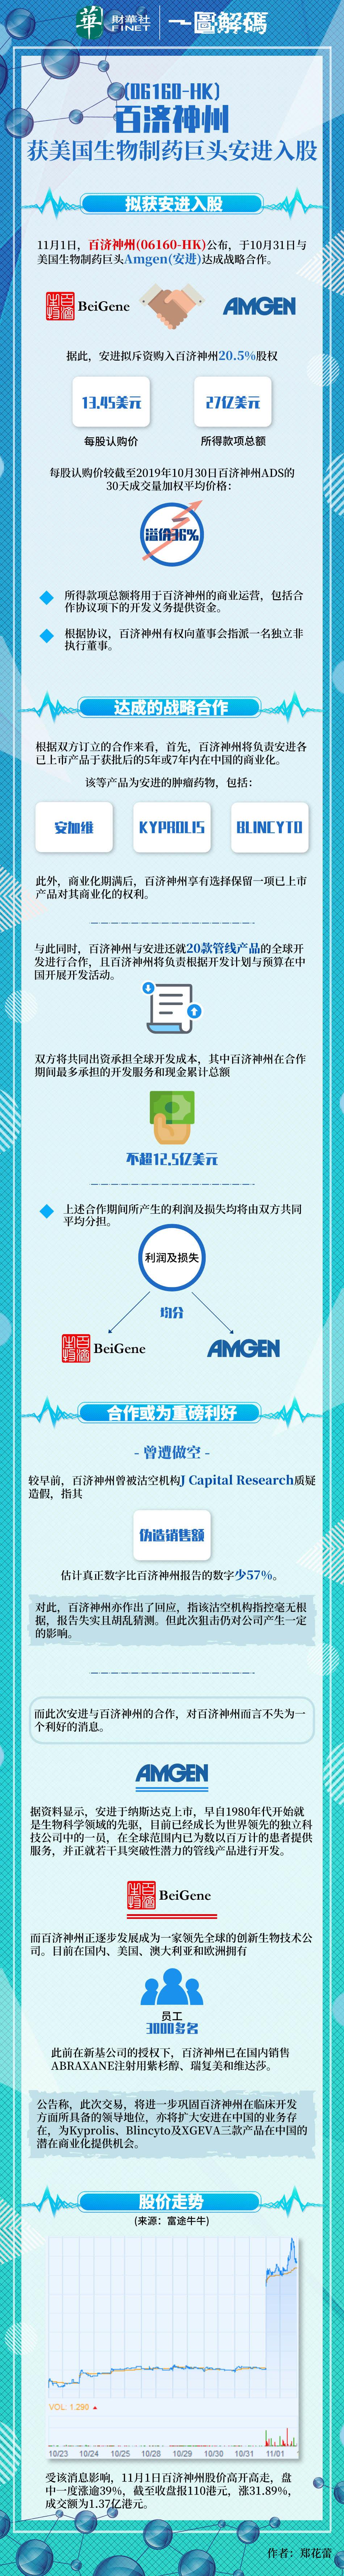 mgm国际娱乐平台|UZI确认RNG不会引入韩援 明年依旧坚持全华班征战S10赛季